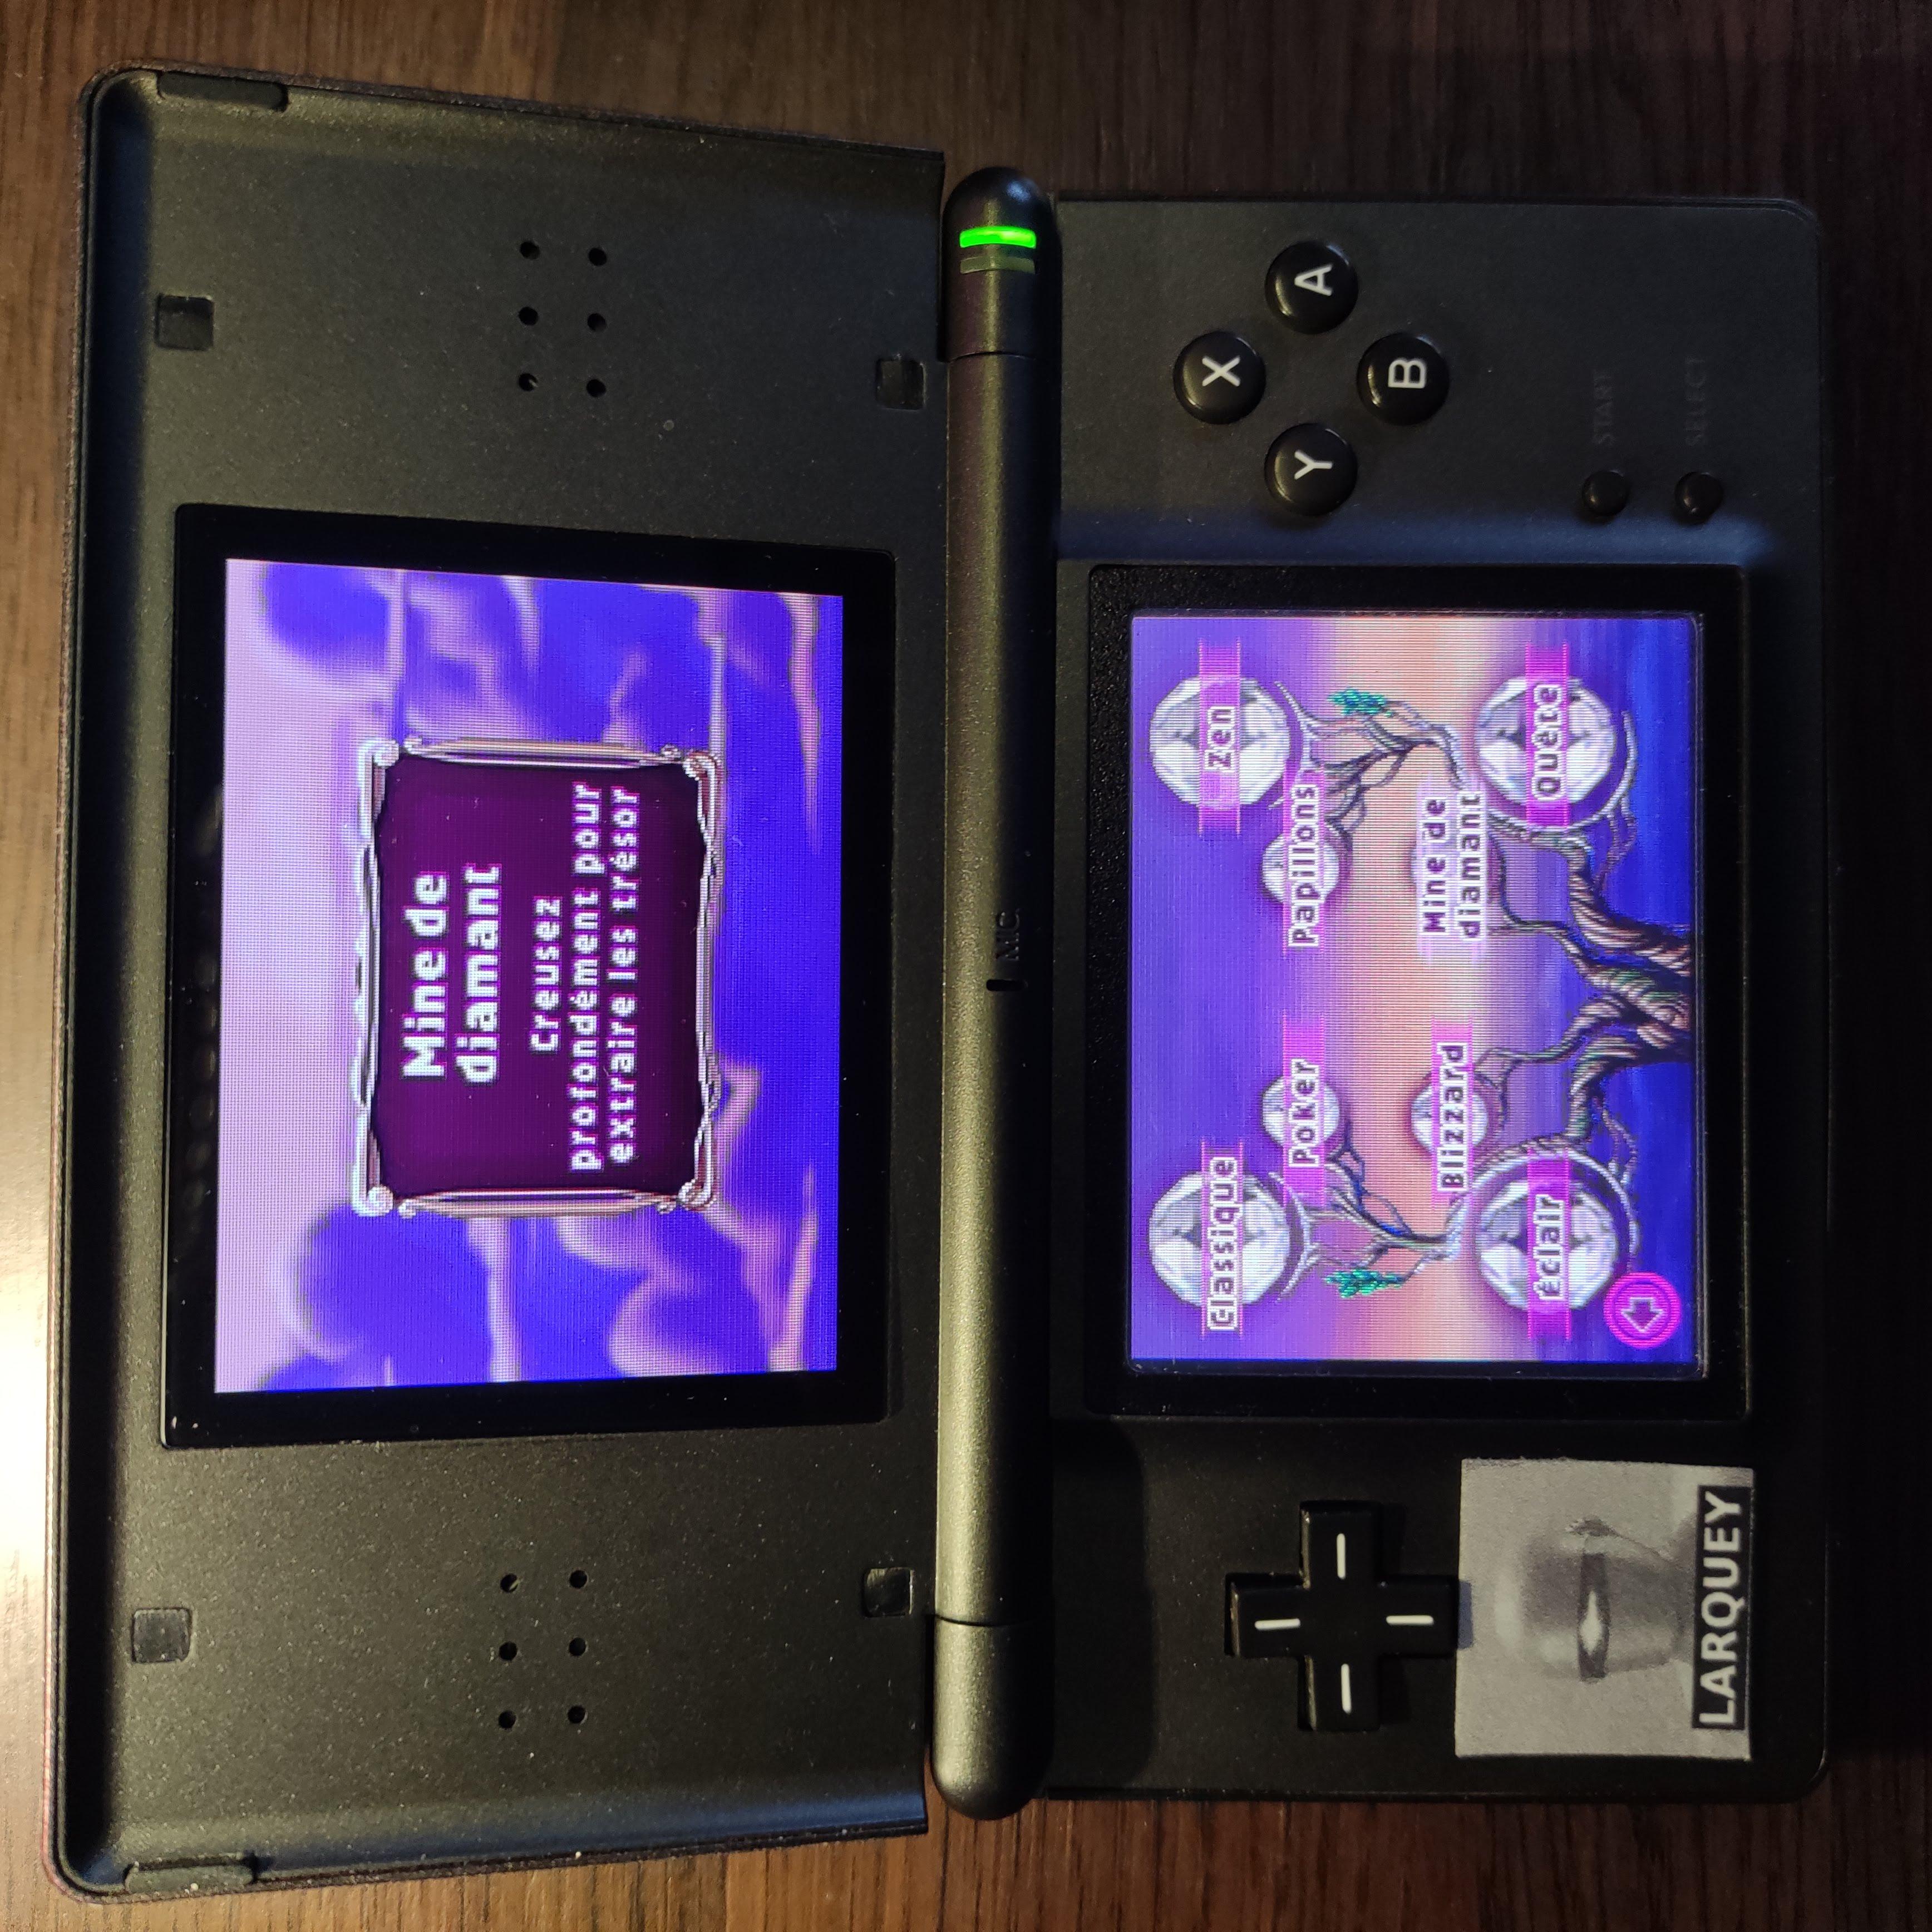 Larquey: Bejeweled 3: Diamond Mine [Max Depth] (Nintendo DS) 60 points on 2020-09-27 12:42:17